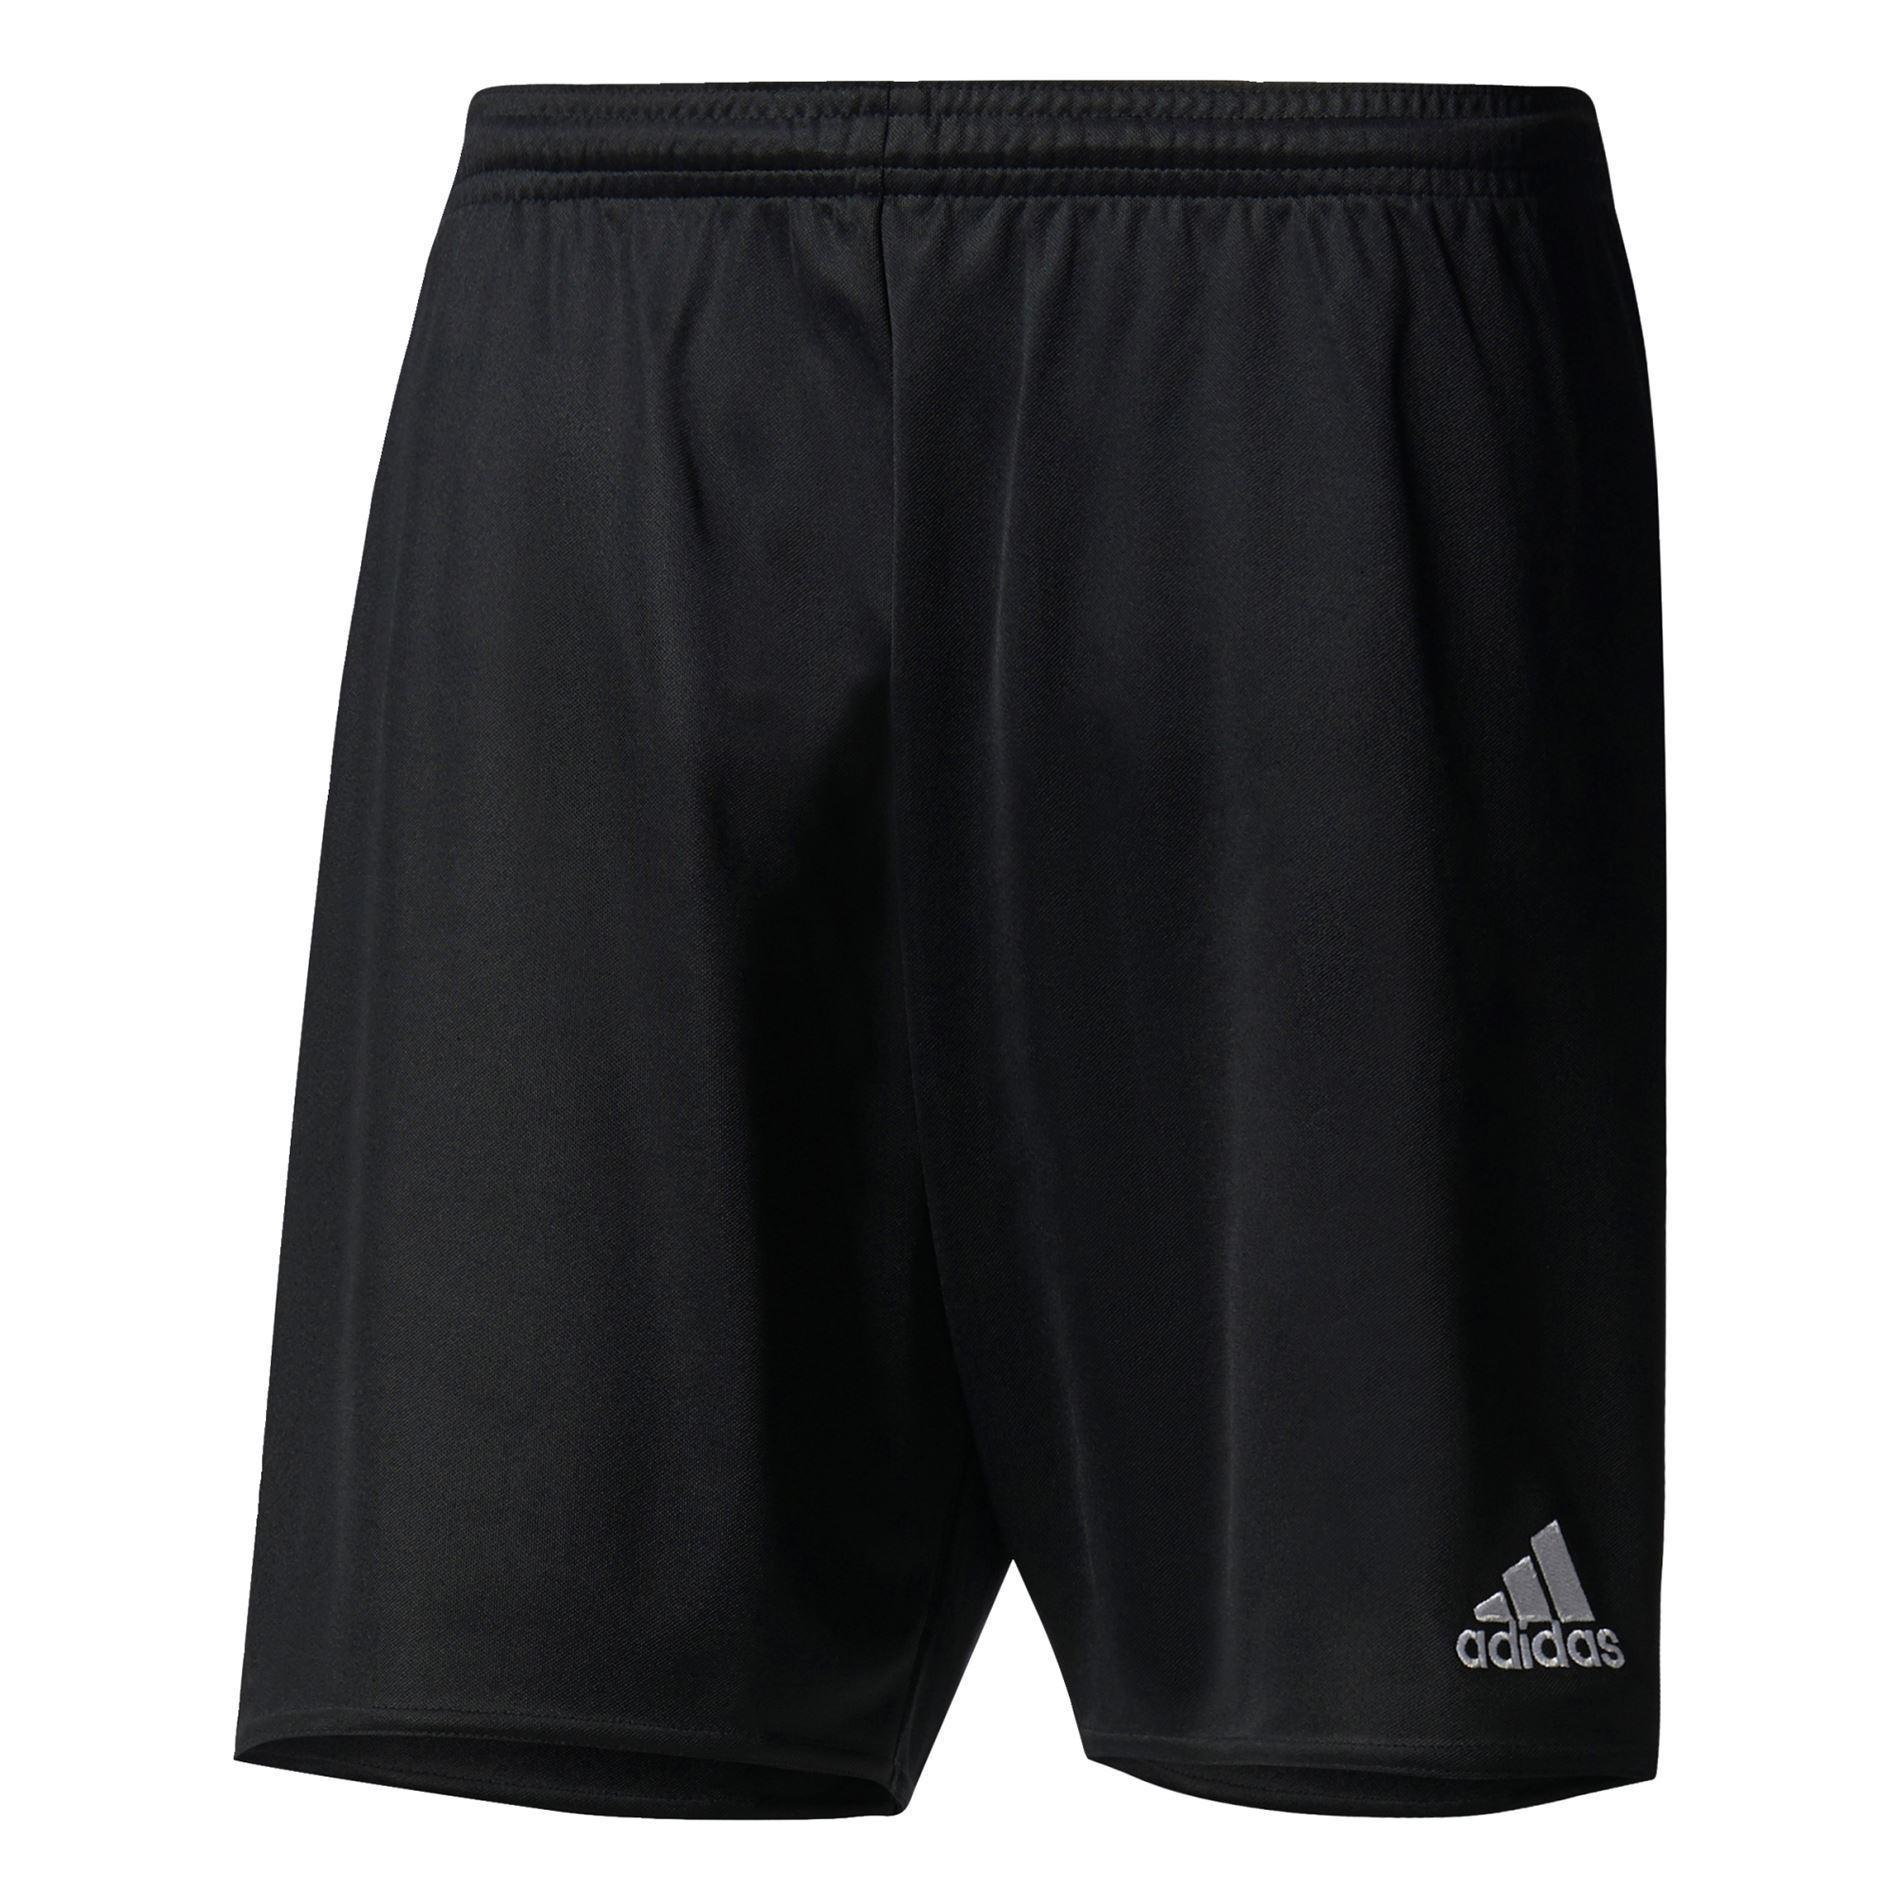 28dc74b8 Adidas Parma 16 Shorts WB Utleira IL- Fotballsko.no - Sko fra Adidas ...